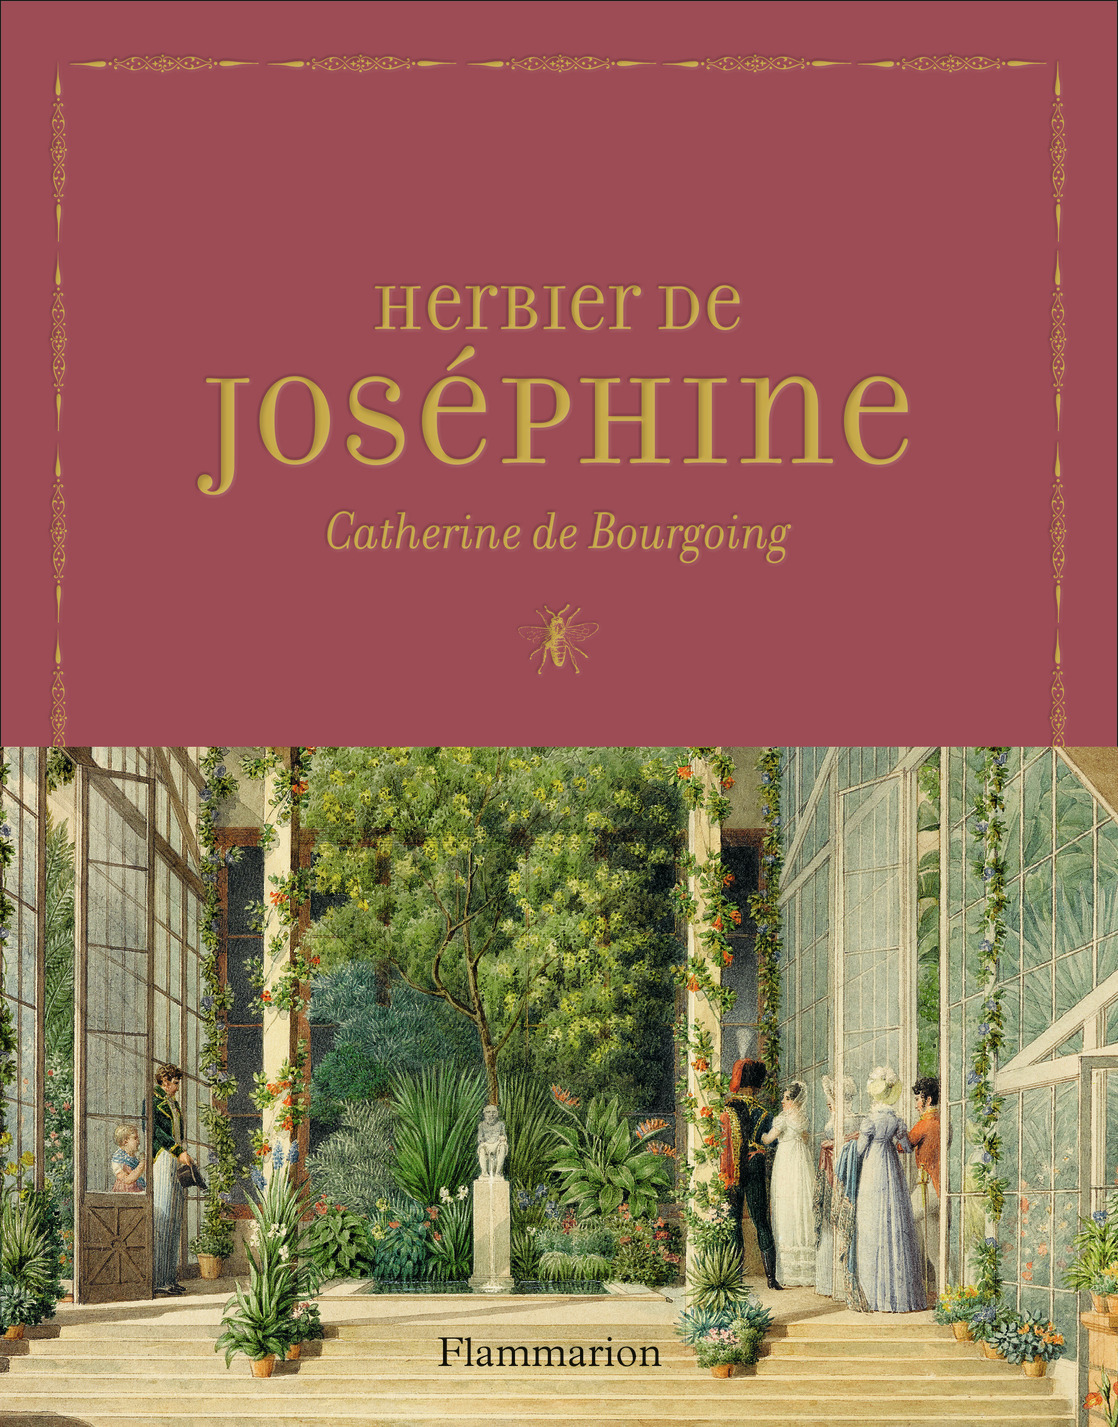 L'HERBIER DE JOSEPHINE